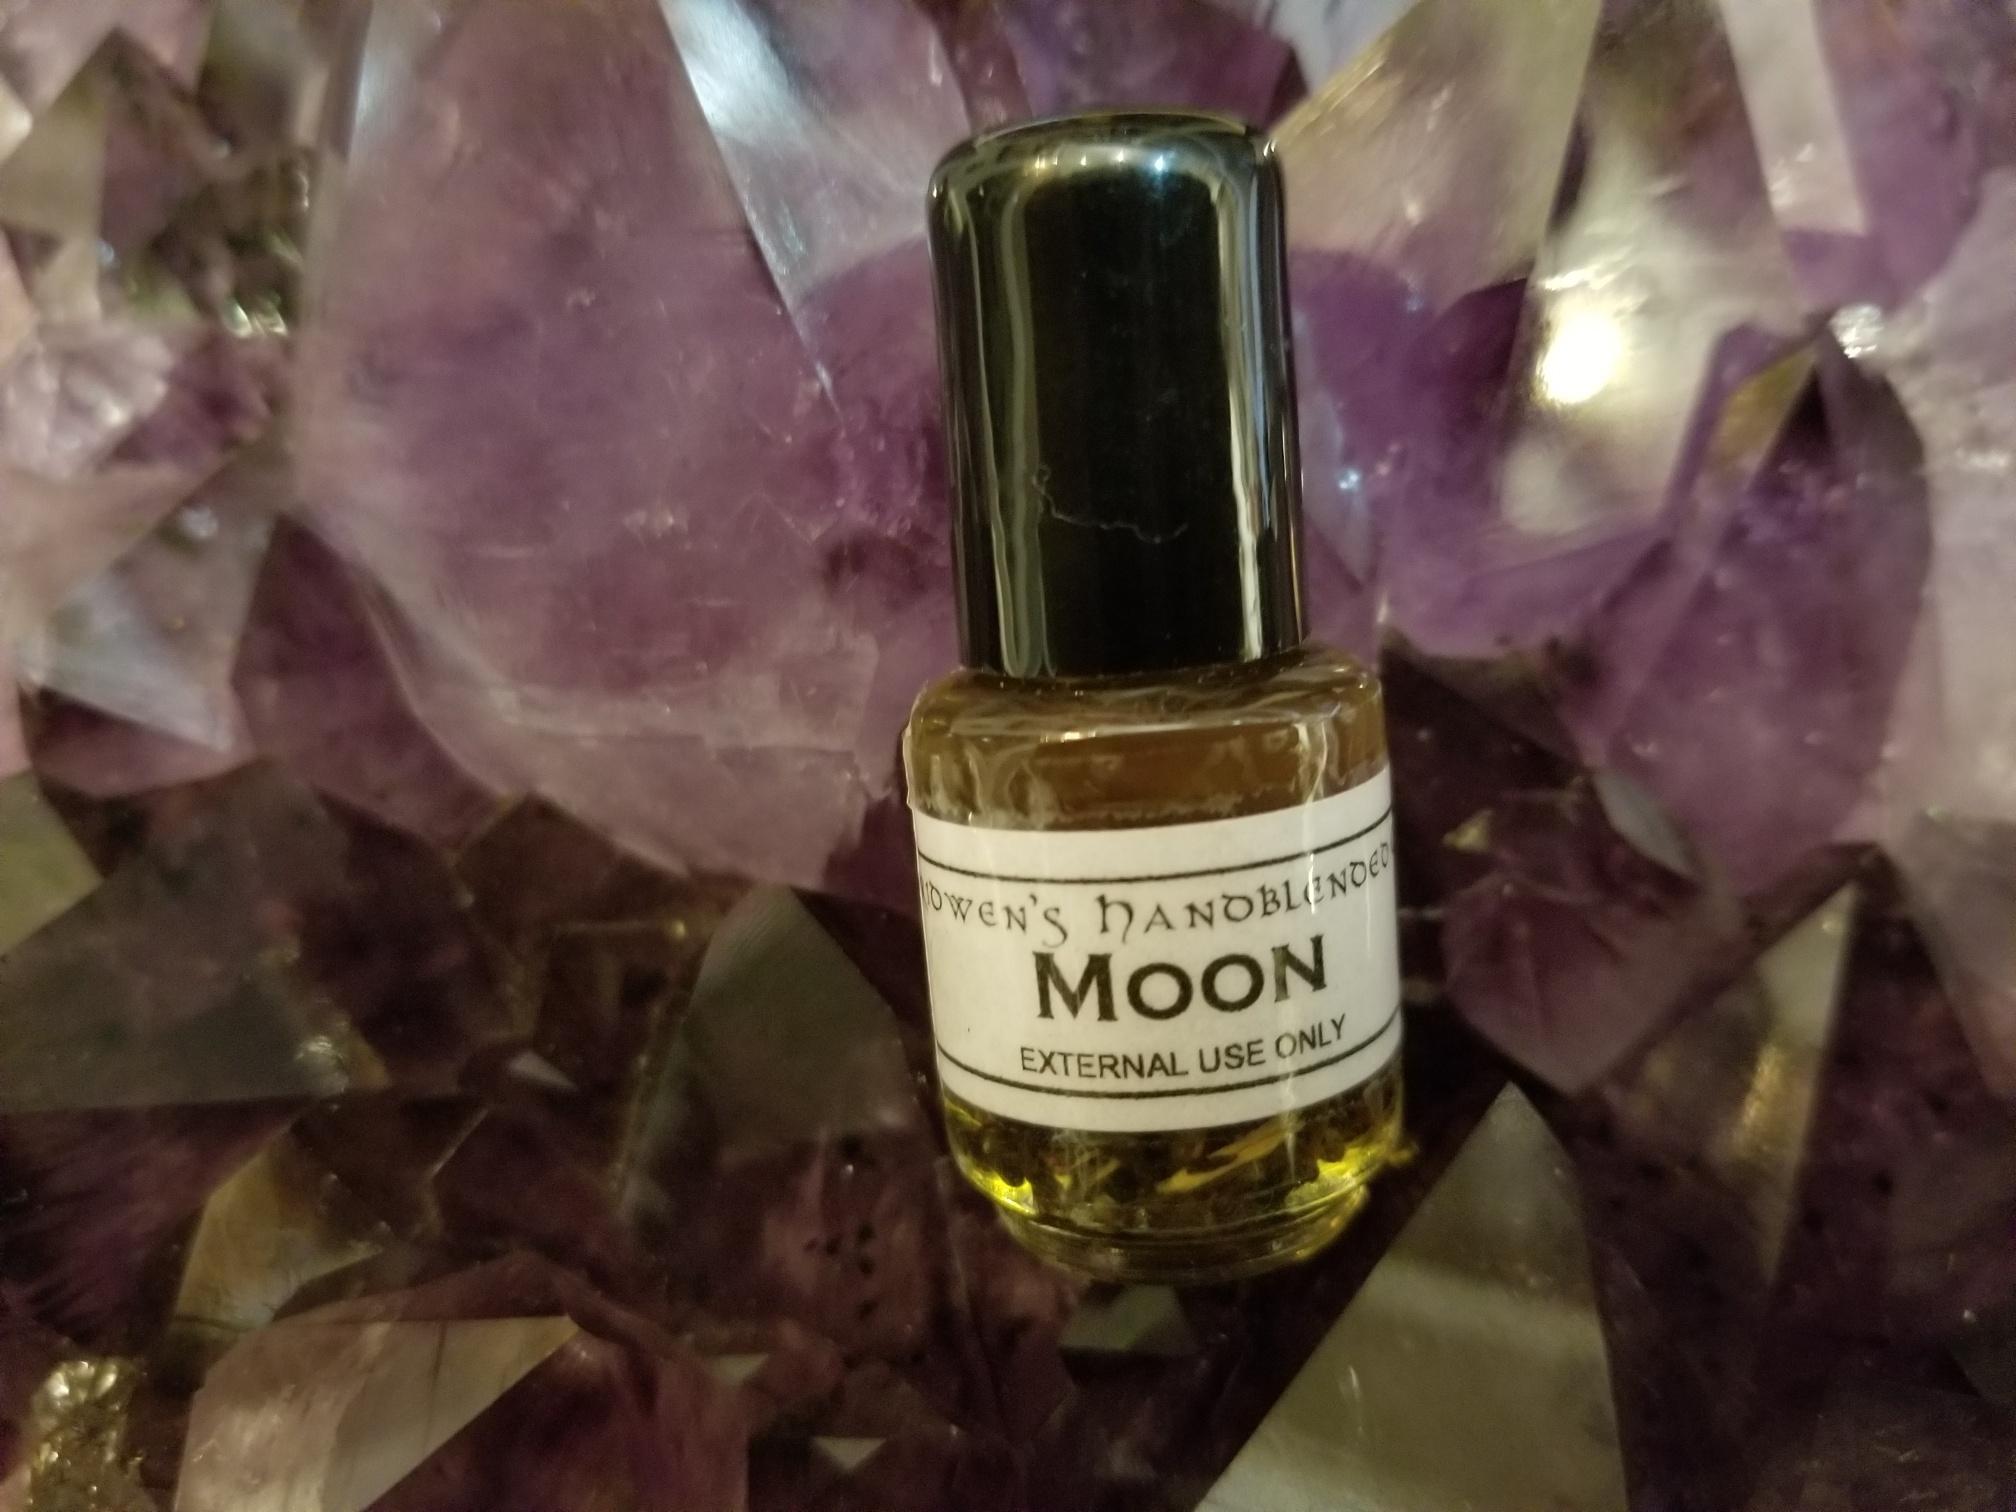 Planetary Fragrances